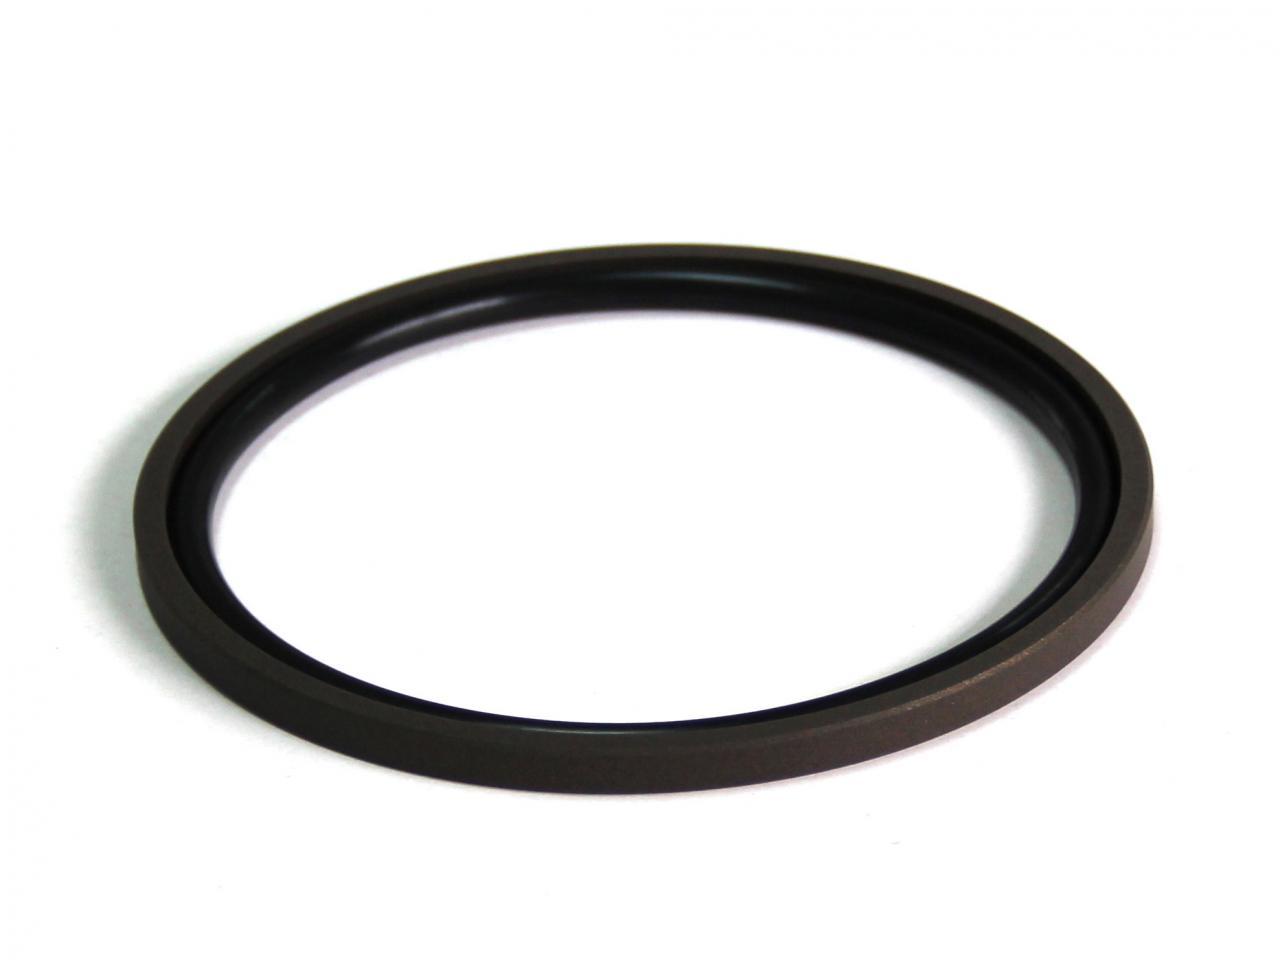 DSH-Piston Seal Design | Piston Seal Bronze Filled PTFE Glyd Ring-6